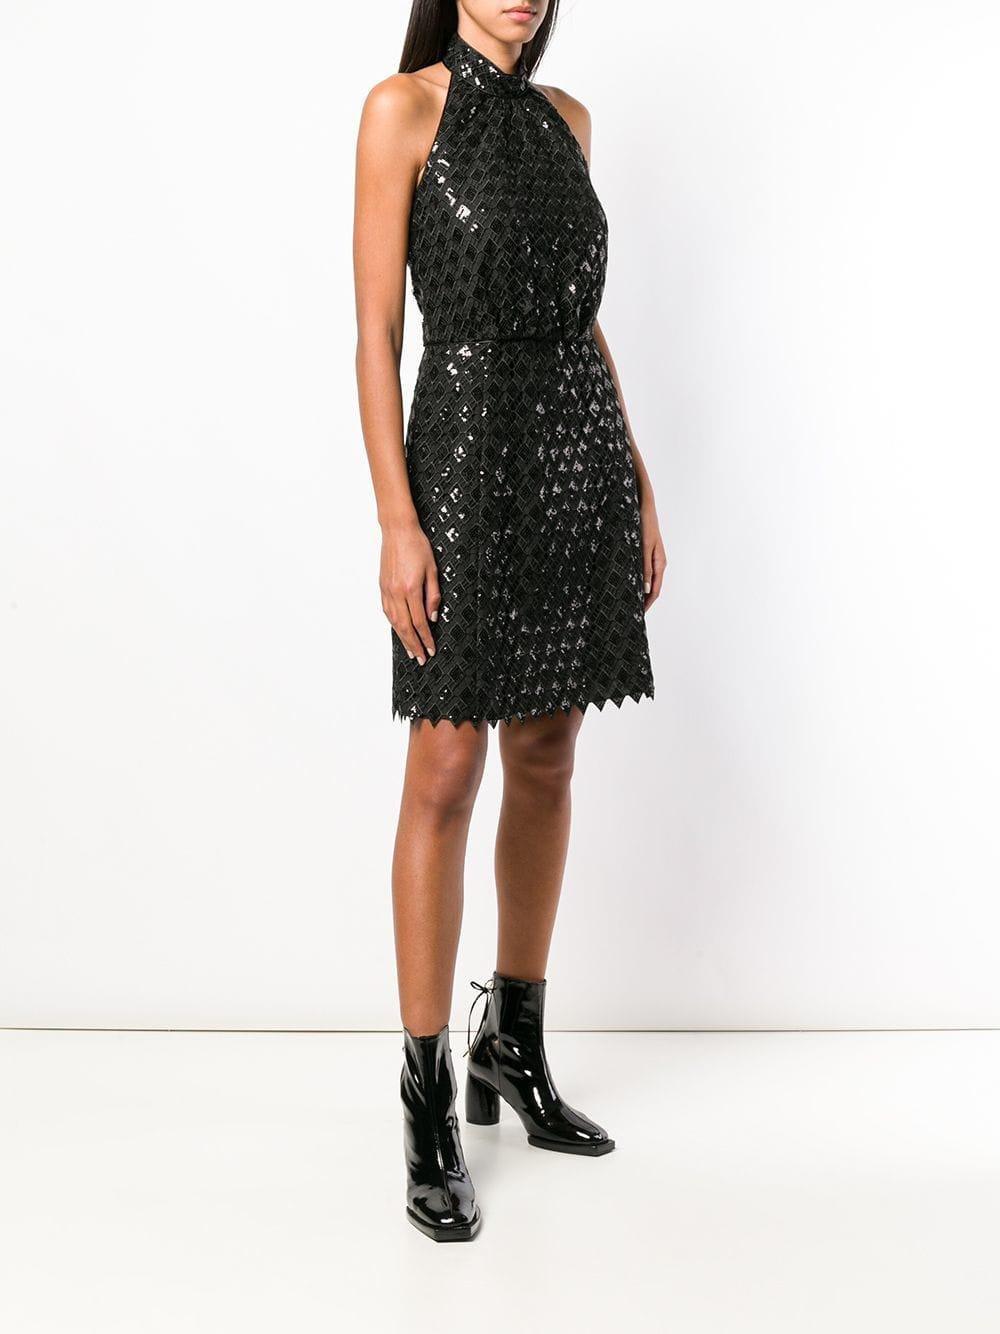 ff3eaa628d4b Emporio Armani Diamond Macramé Dress in Black - Lyst